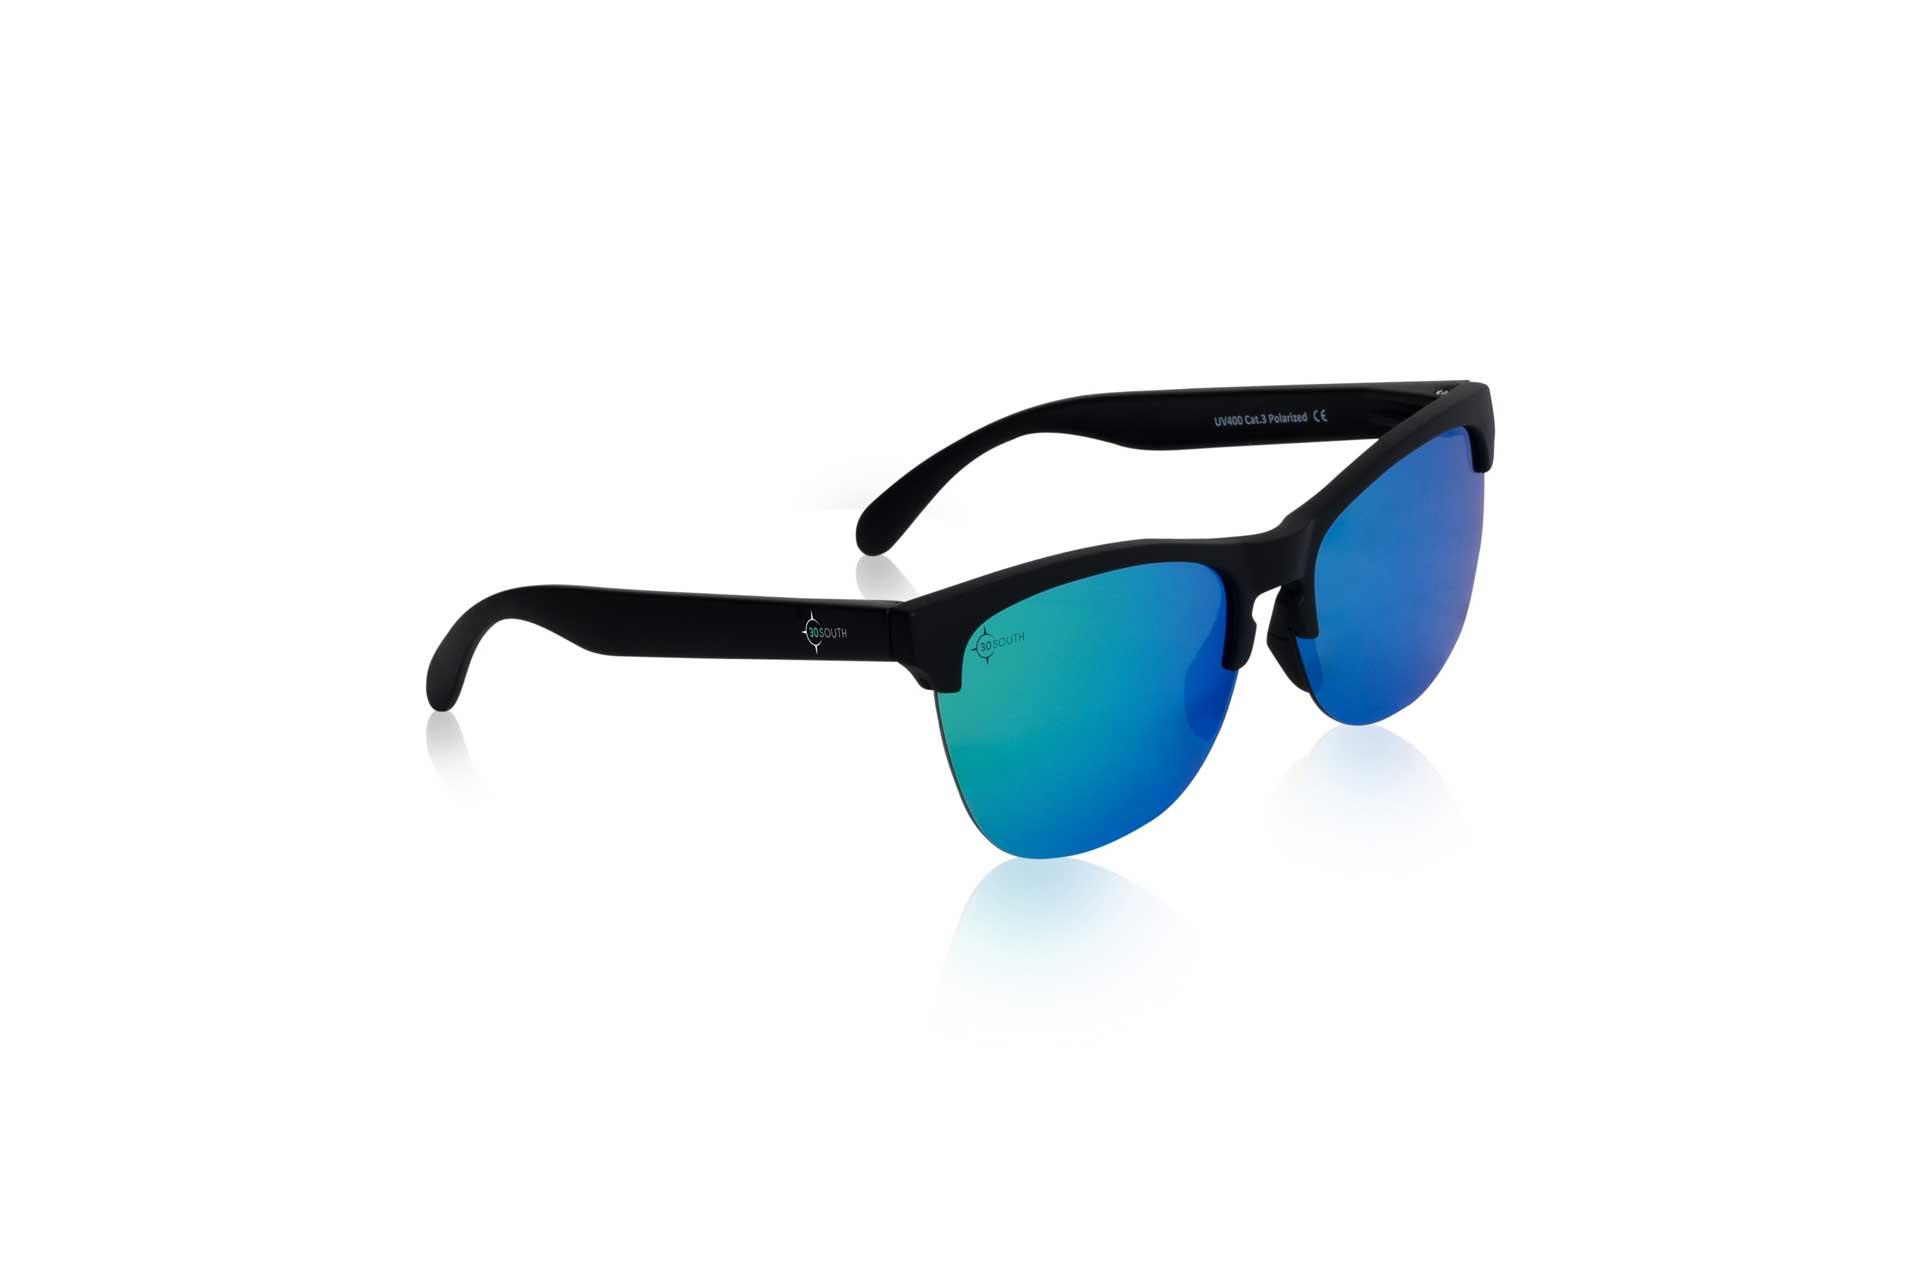 Photo of The Maverick Emerald sunglasses